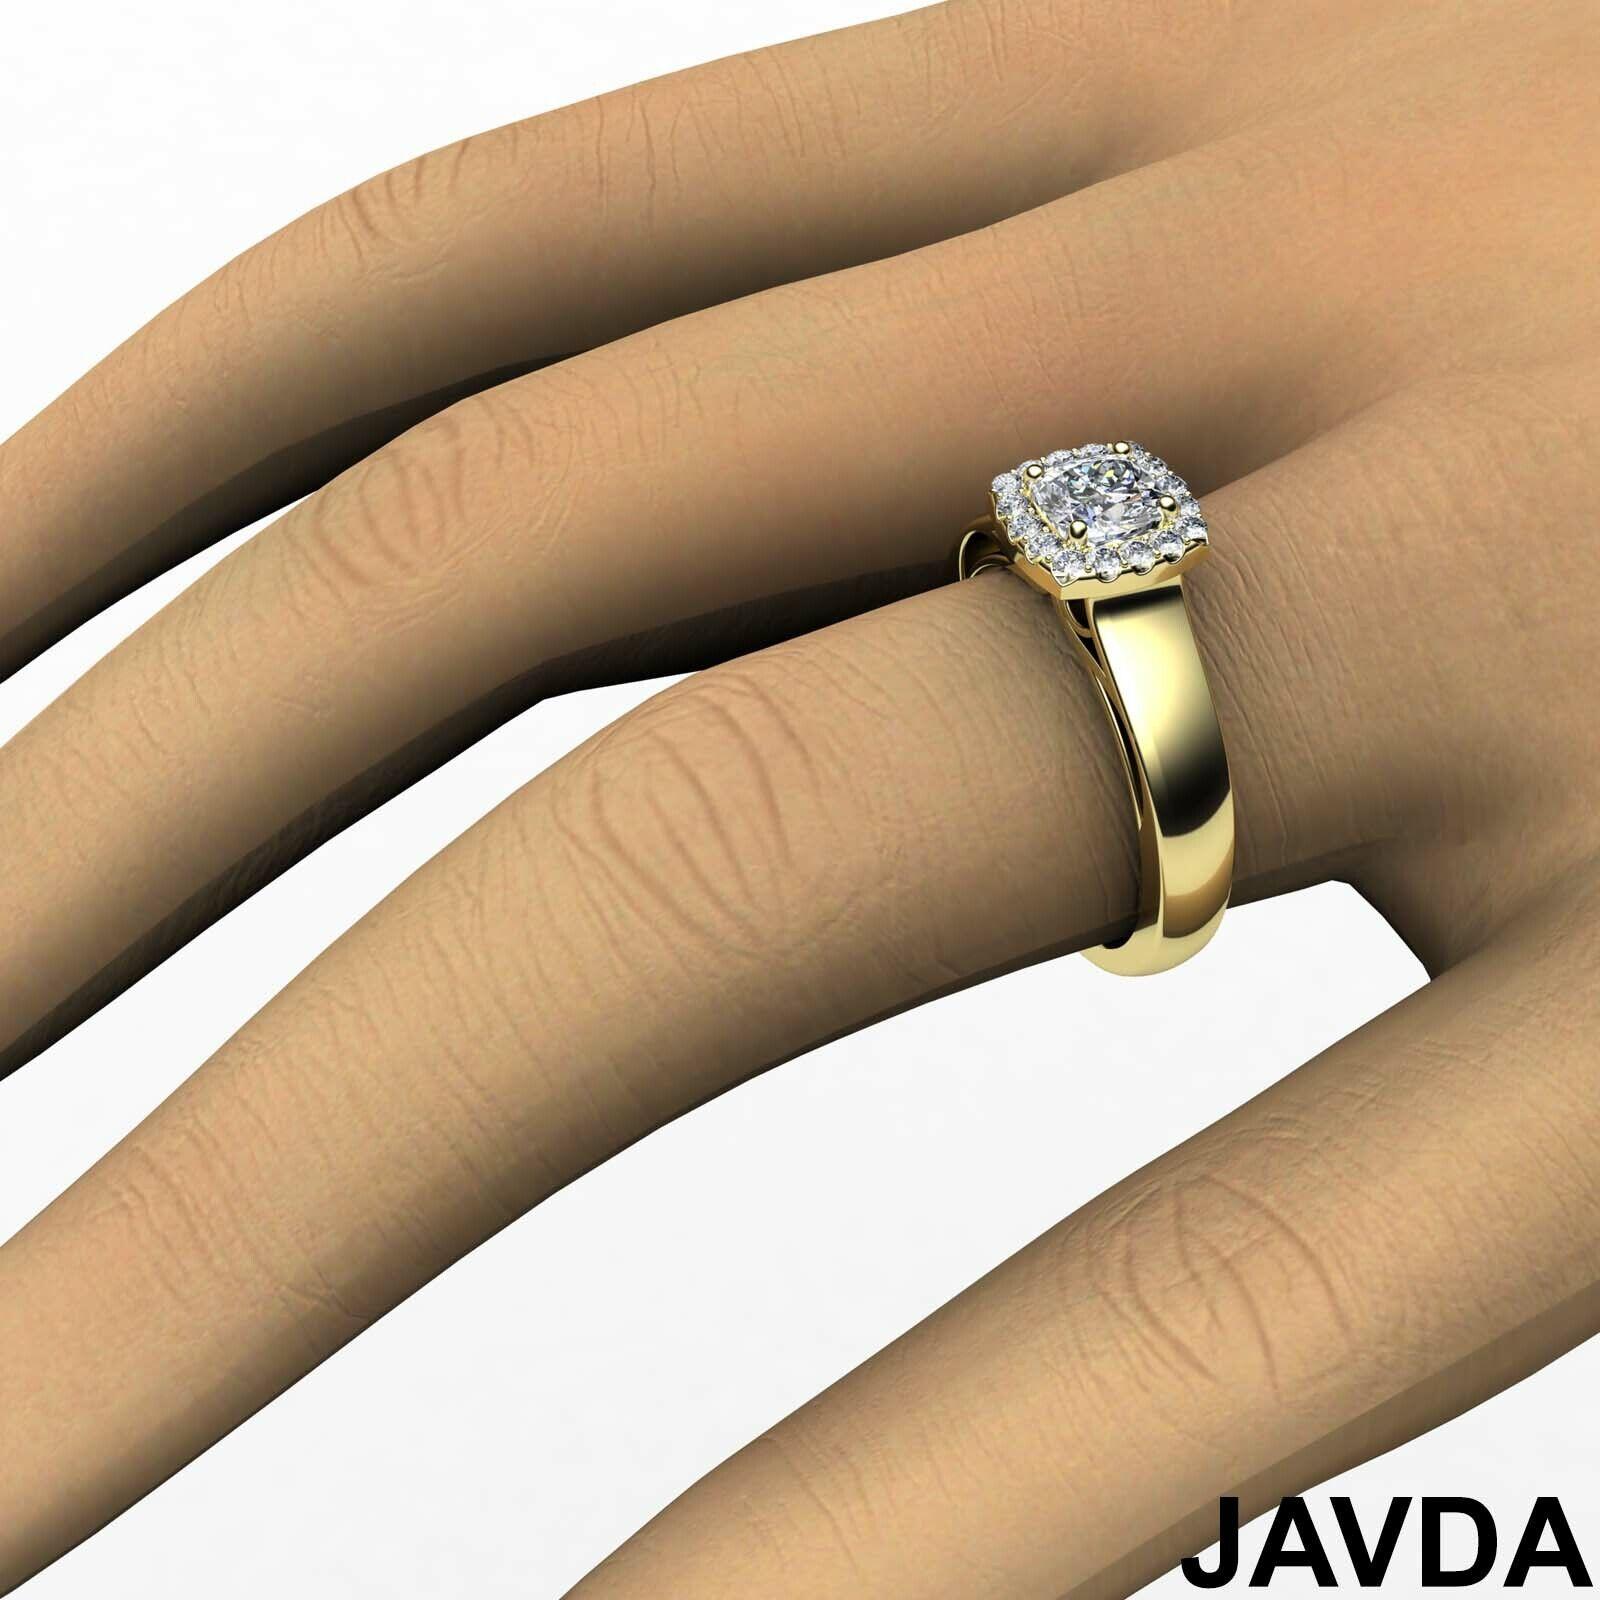 Filigree Shank U Cut Prong Cushion Diamond Engagement GIA H Color VS1 Ring 0.7Ct 7